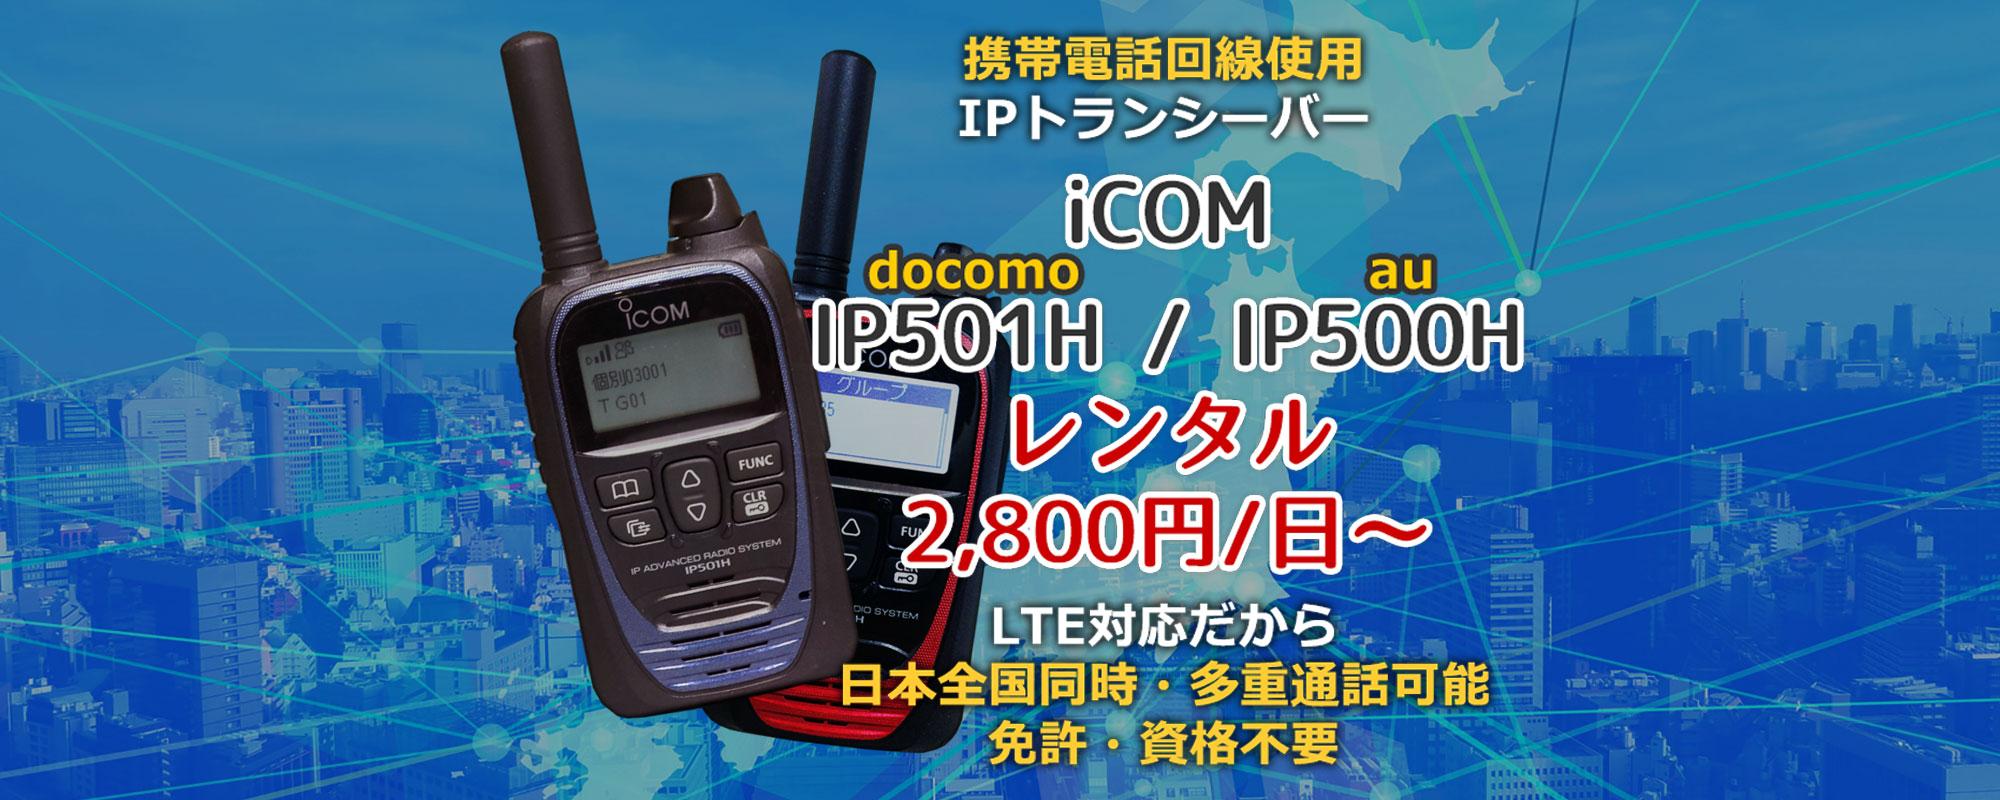 LTEトランシーバー iCOM IP501H - docomo / IP500H - au を1日2,800円/台からレンタル